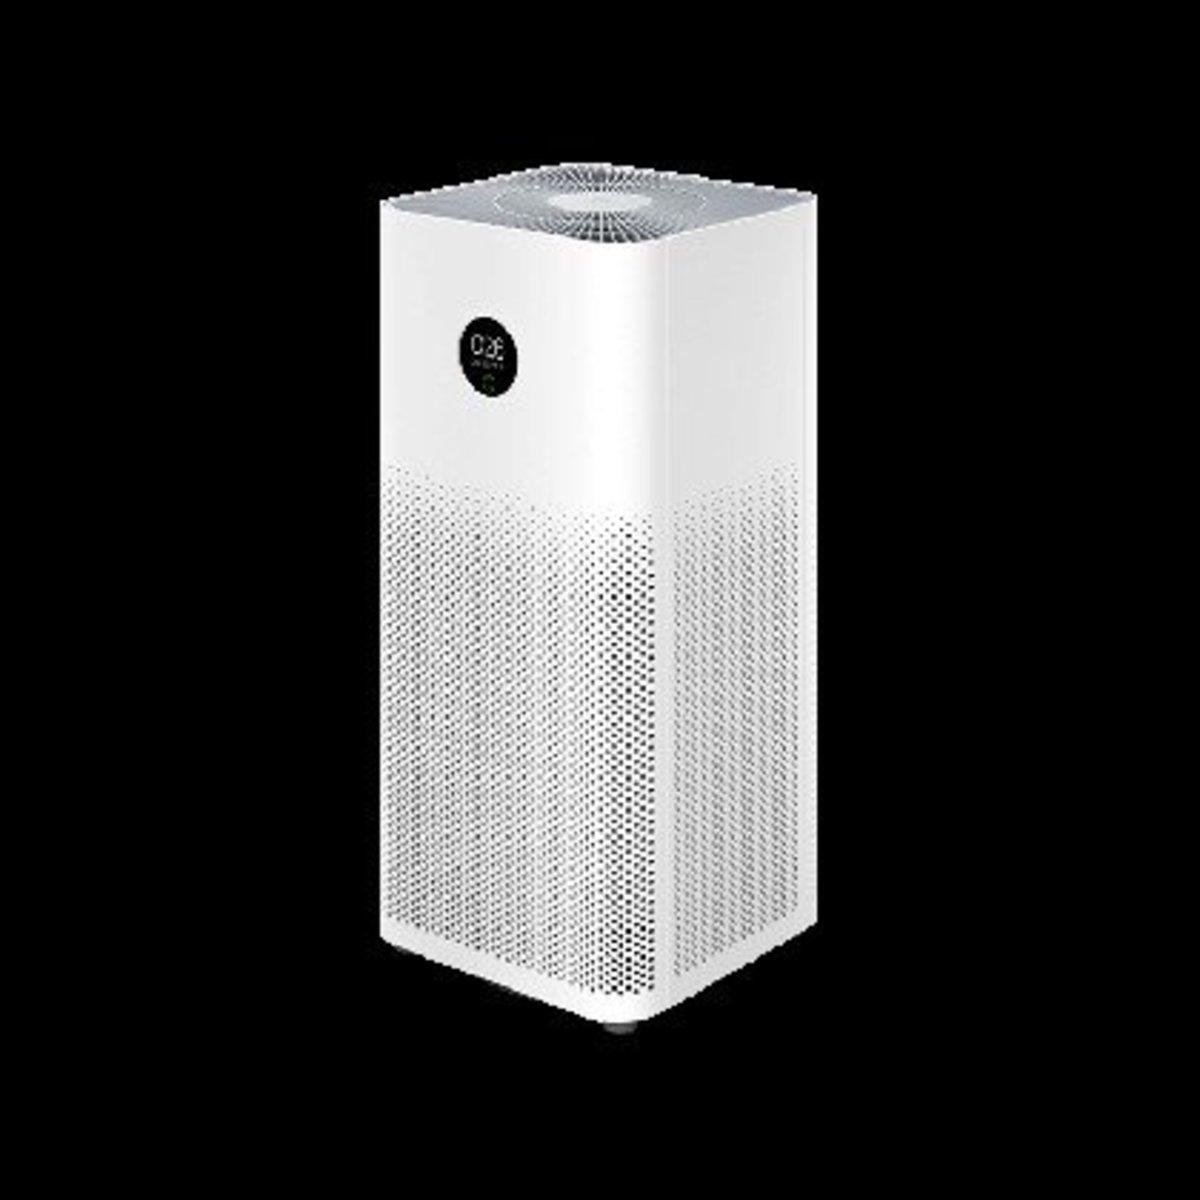 MI Air freshener 3